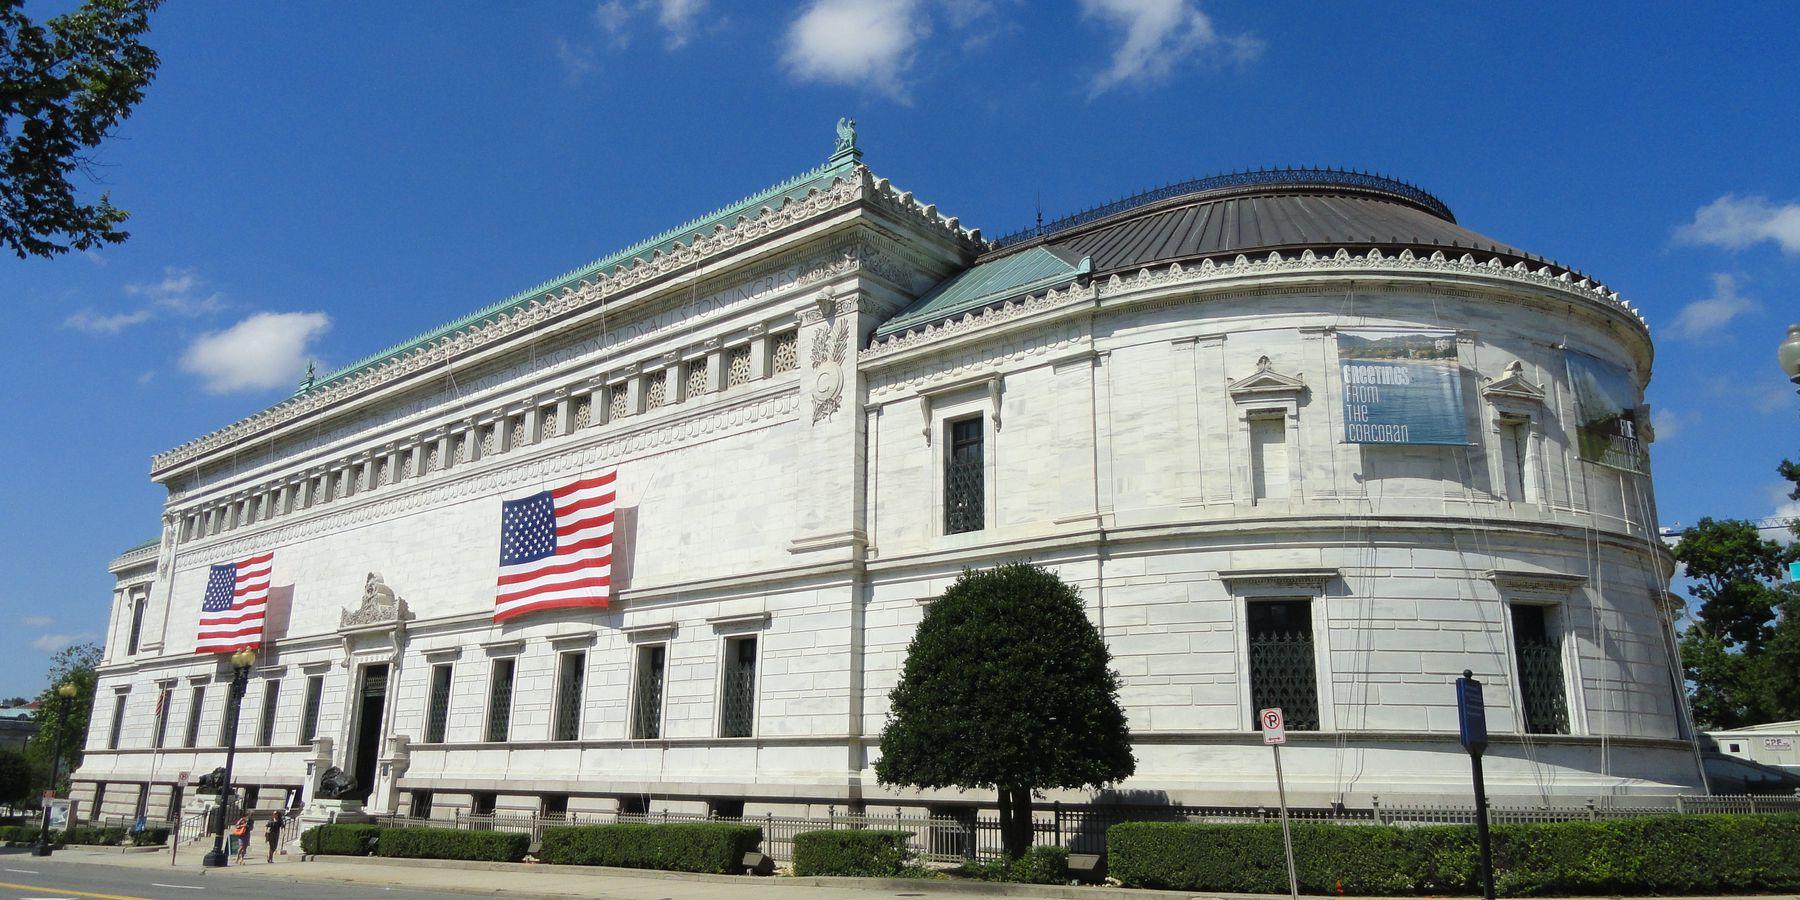 Corcoran Gallery of Art - Washington D.C. - Doets Reizen